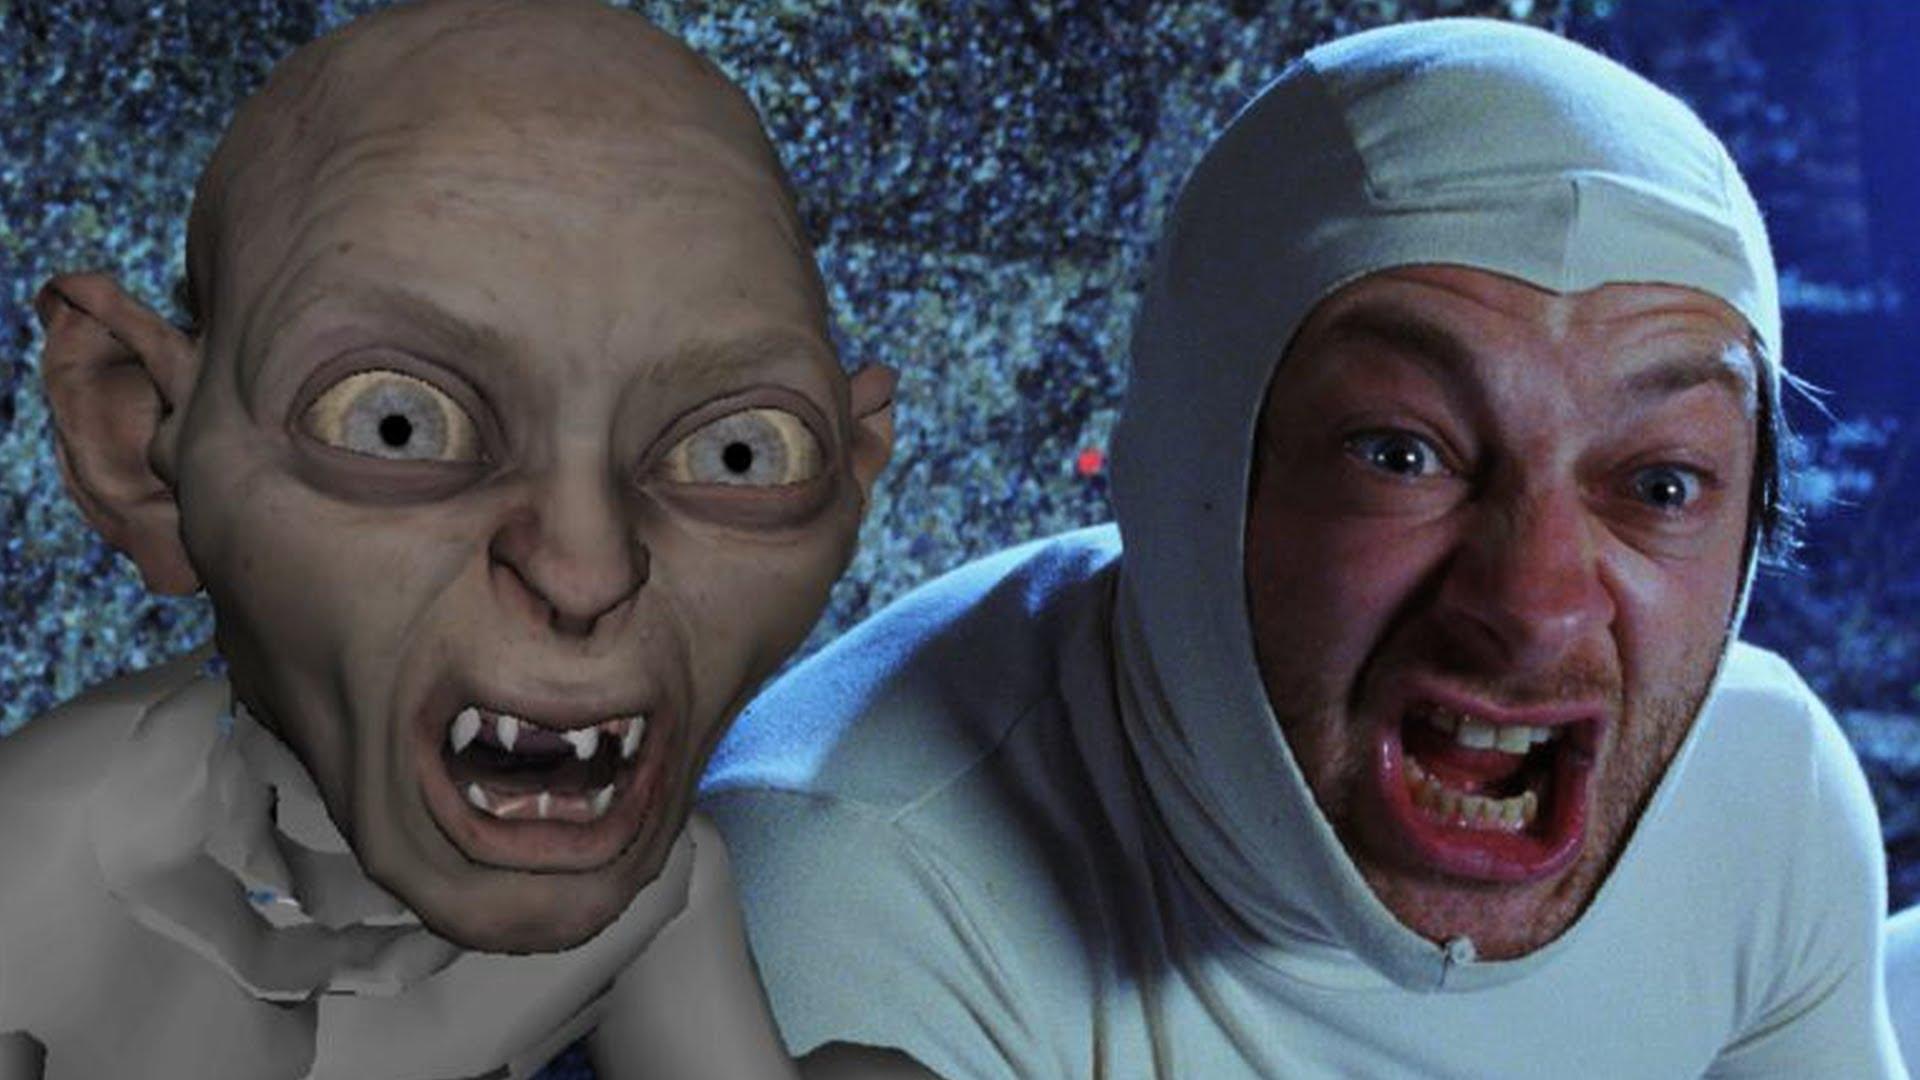 Andy-Serkis-smeagol-gollum